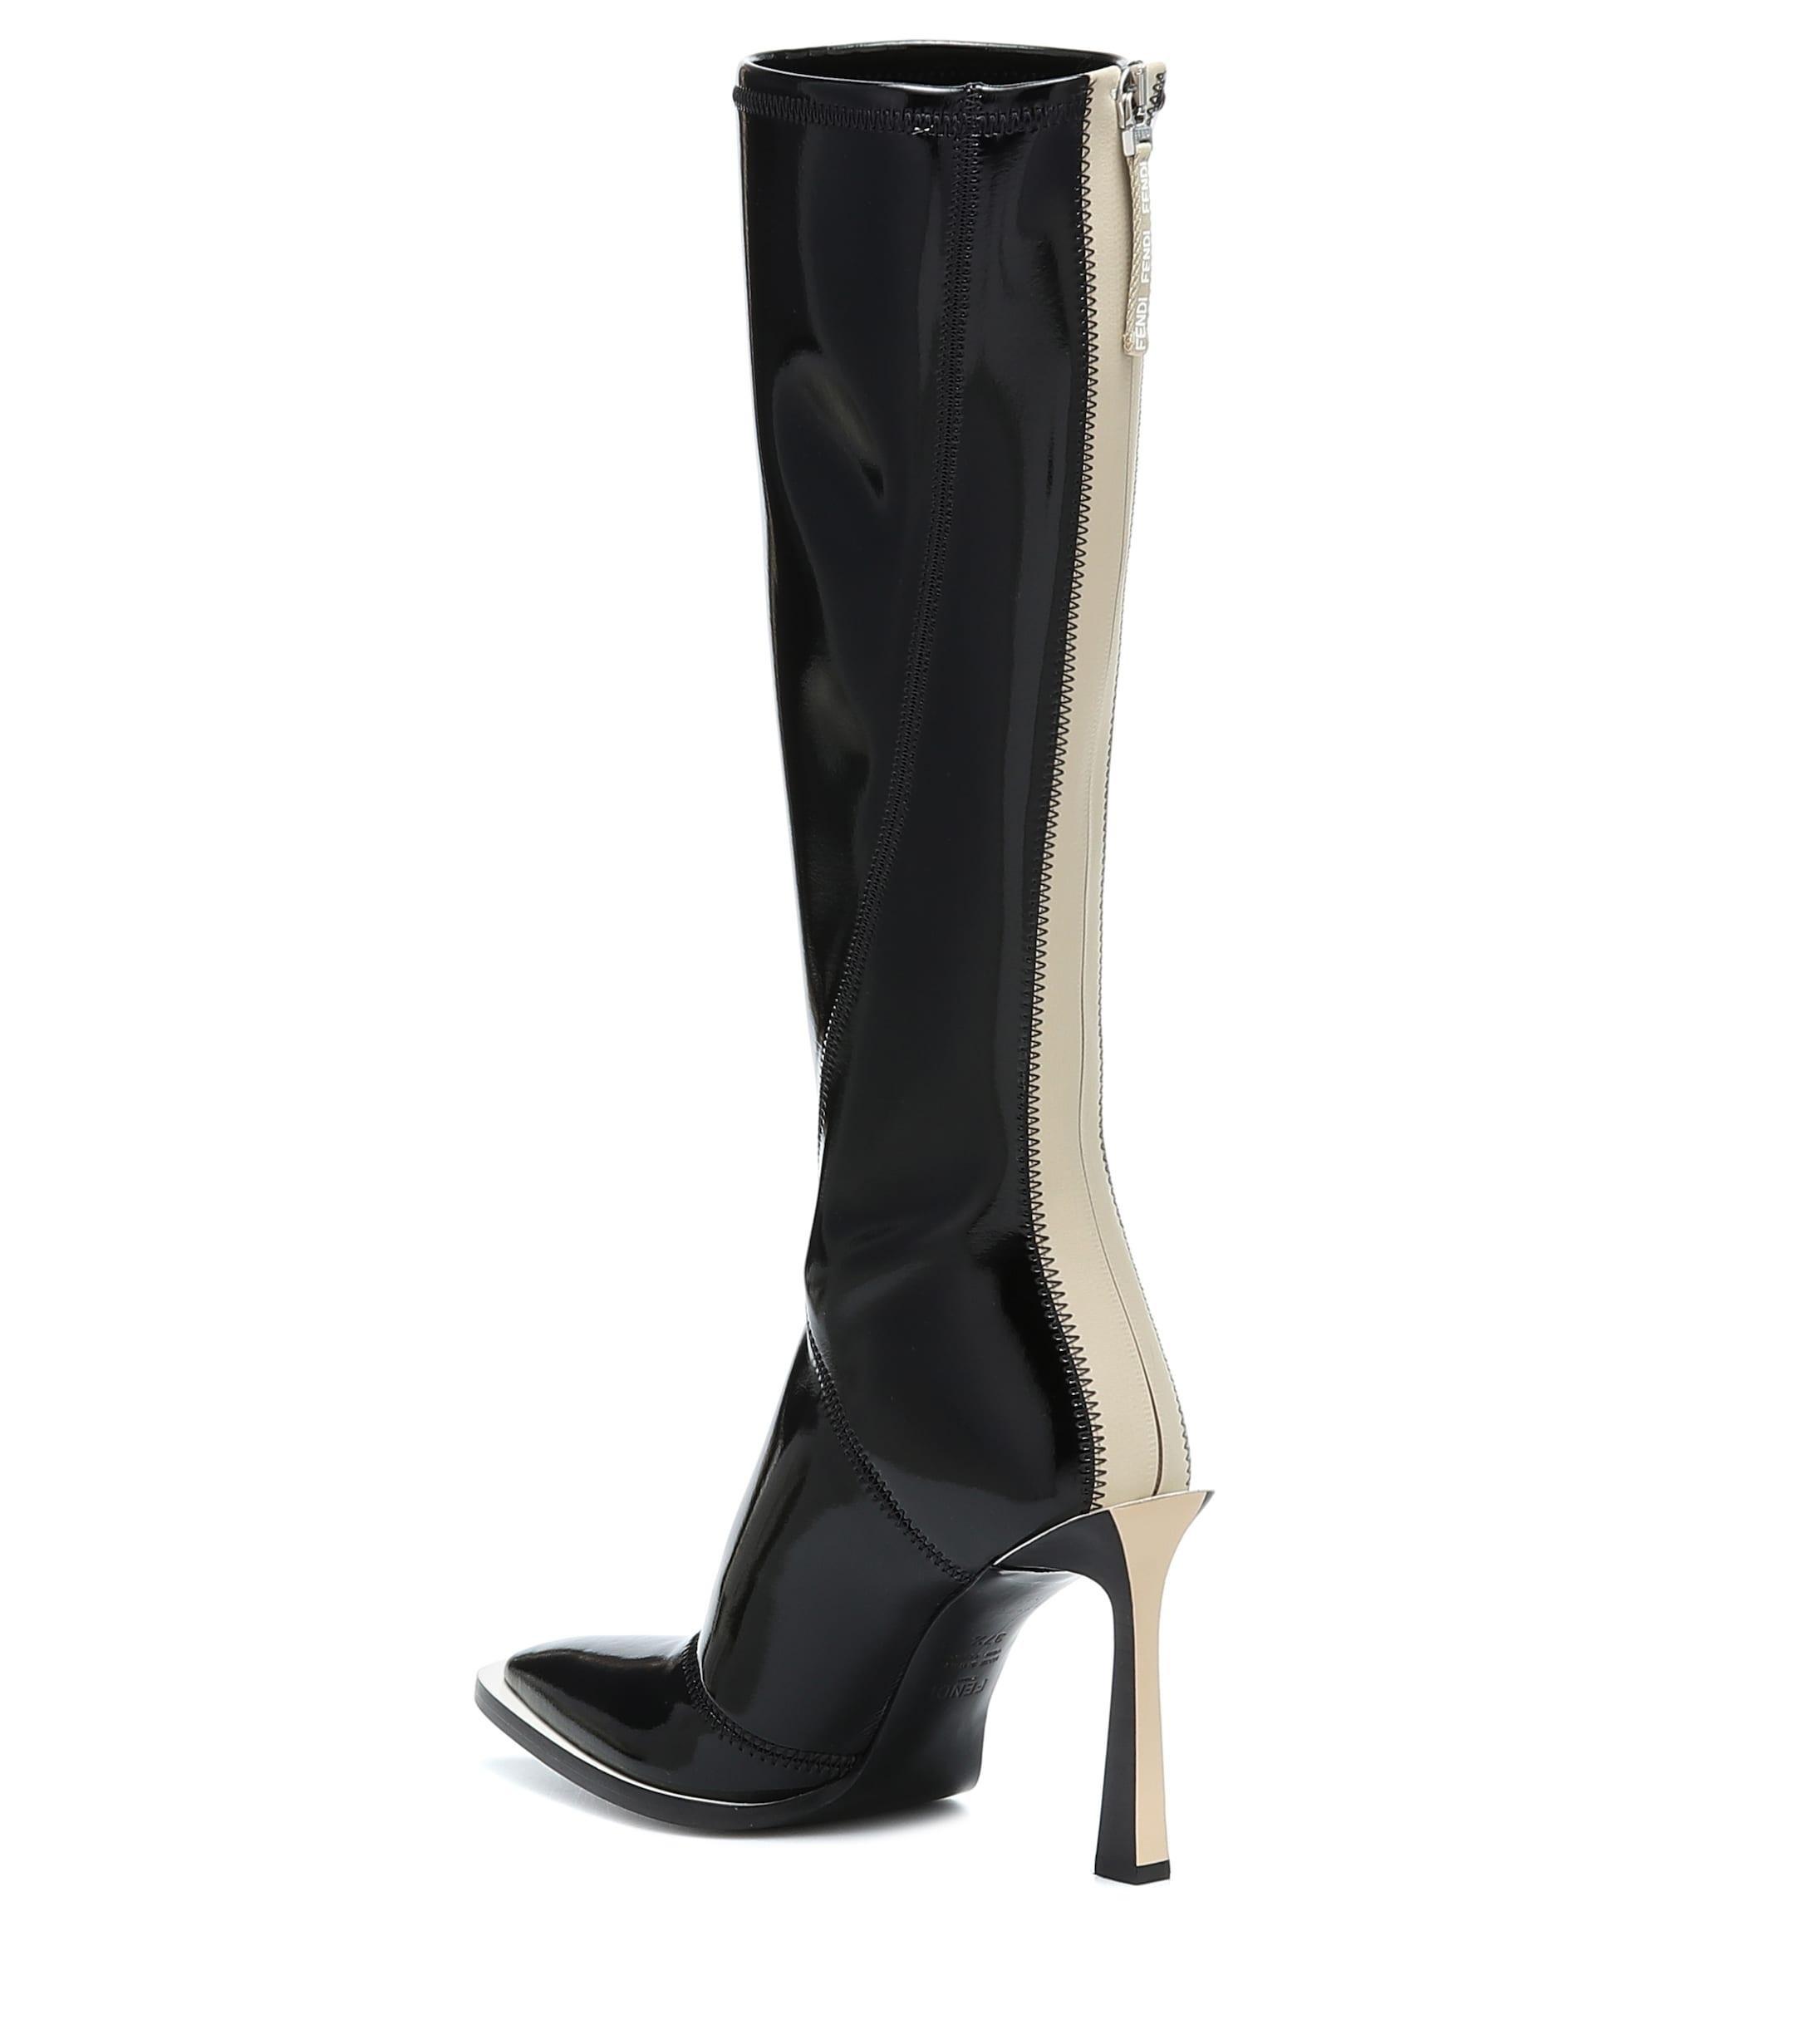 Botas altas FFrame de neopreno Fendi de Neopreno de color Negro